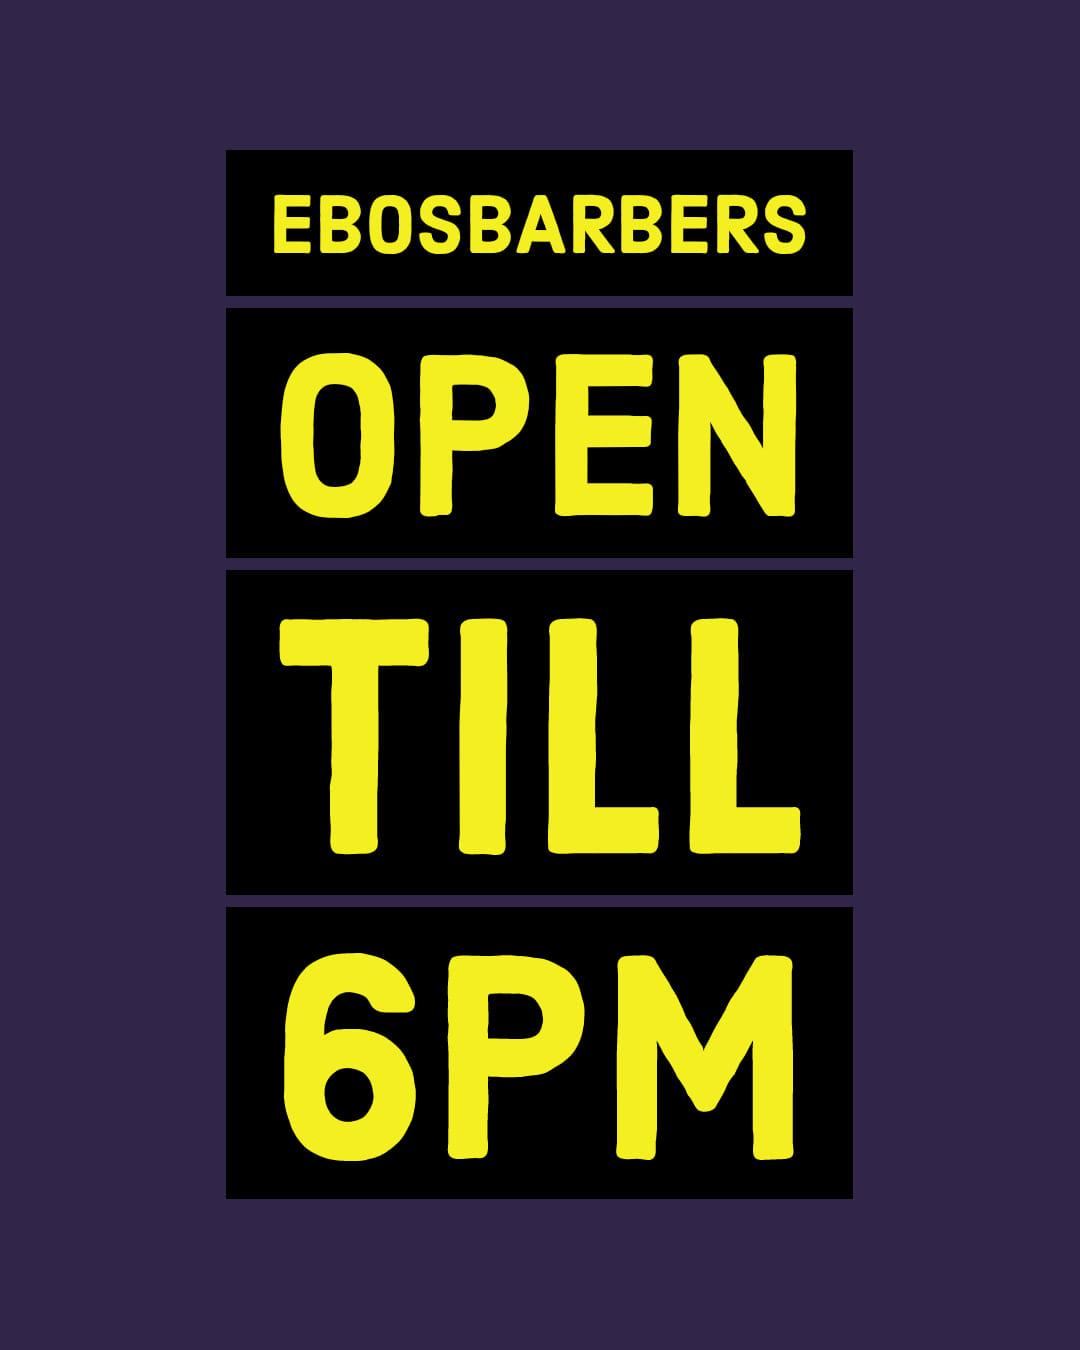 ebosbarbers